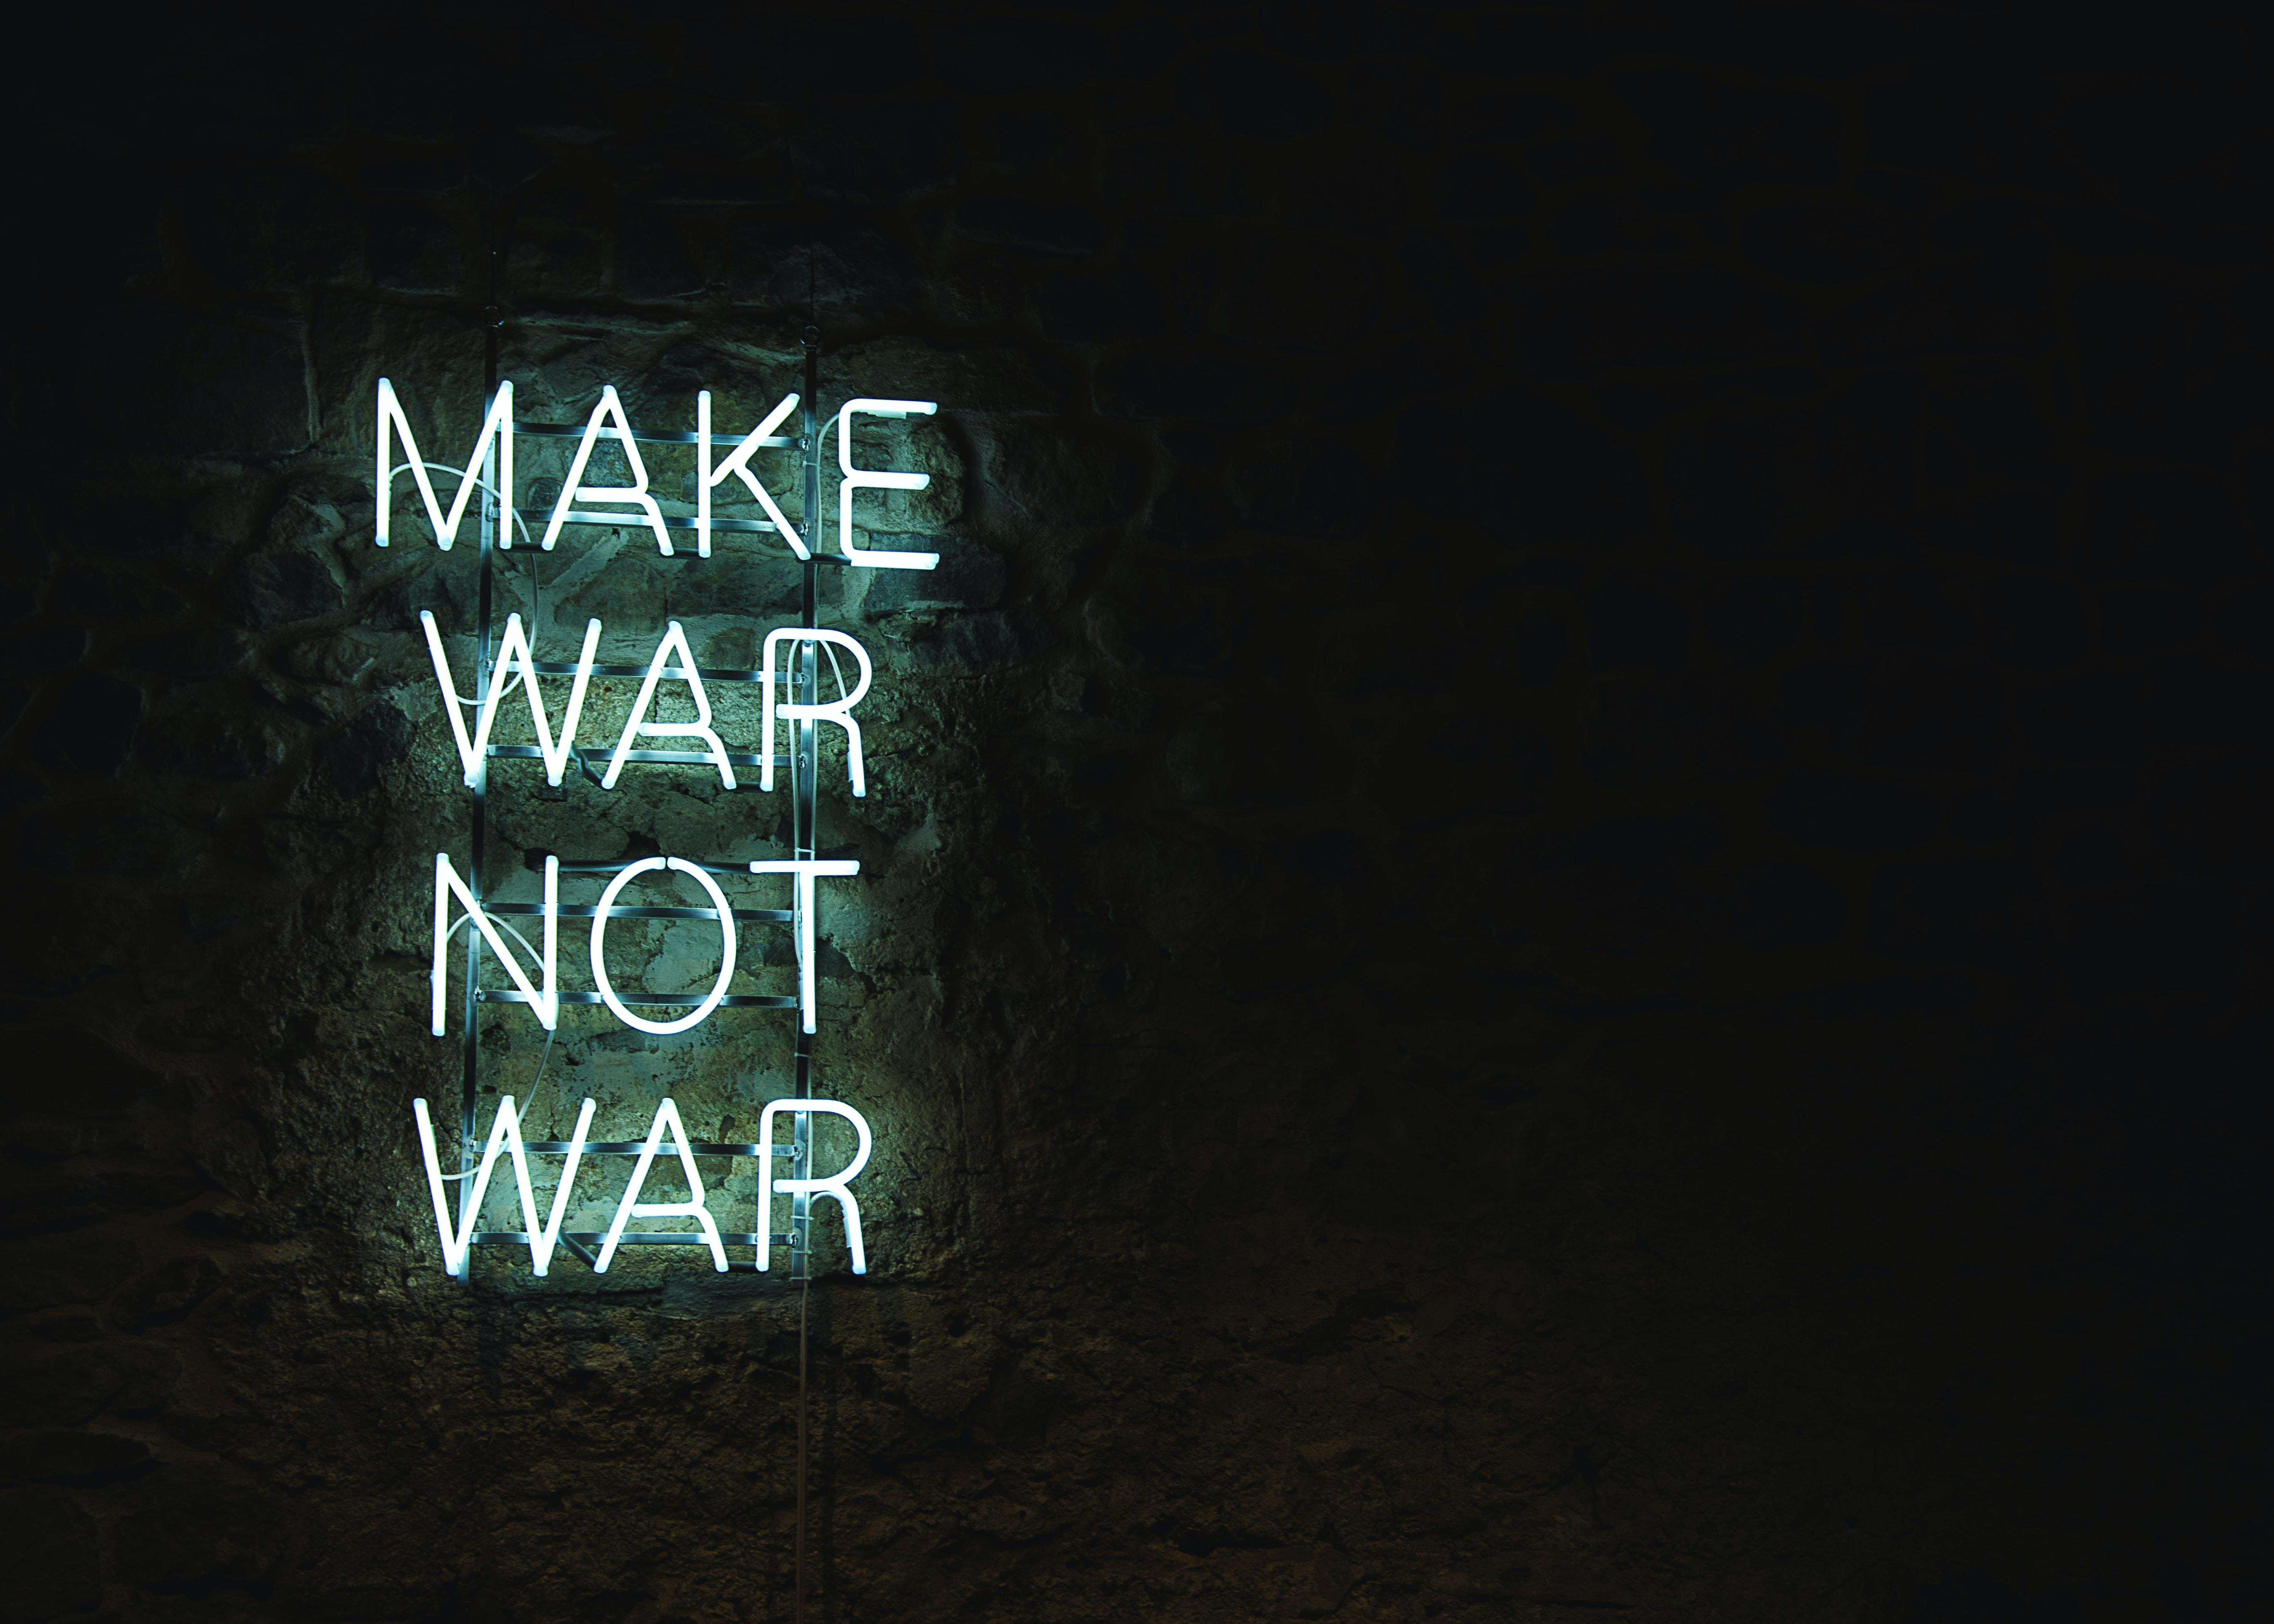 green make war not war LED signage